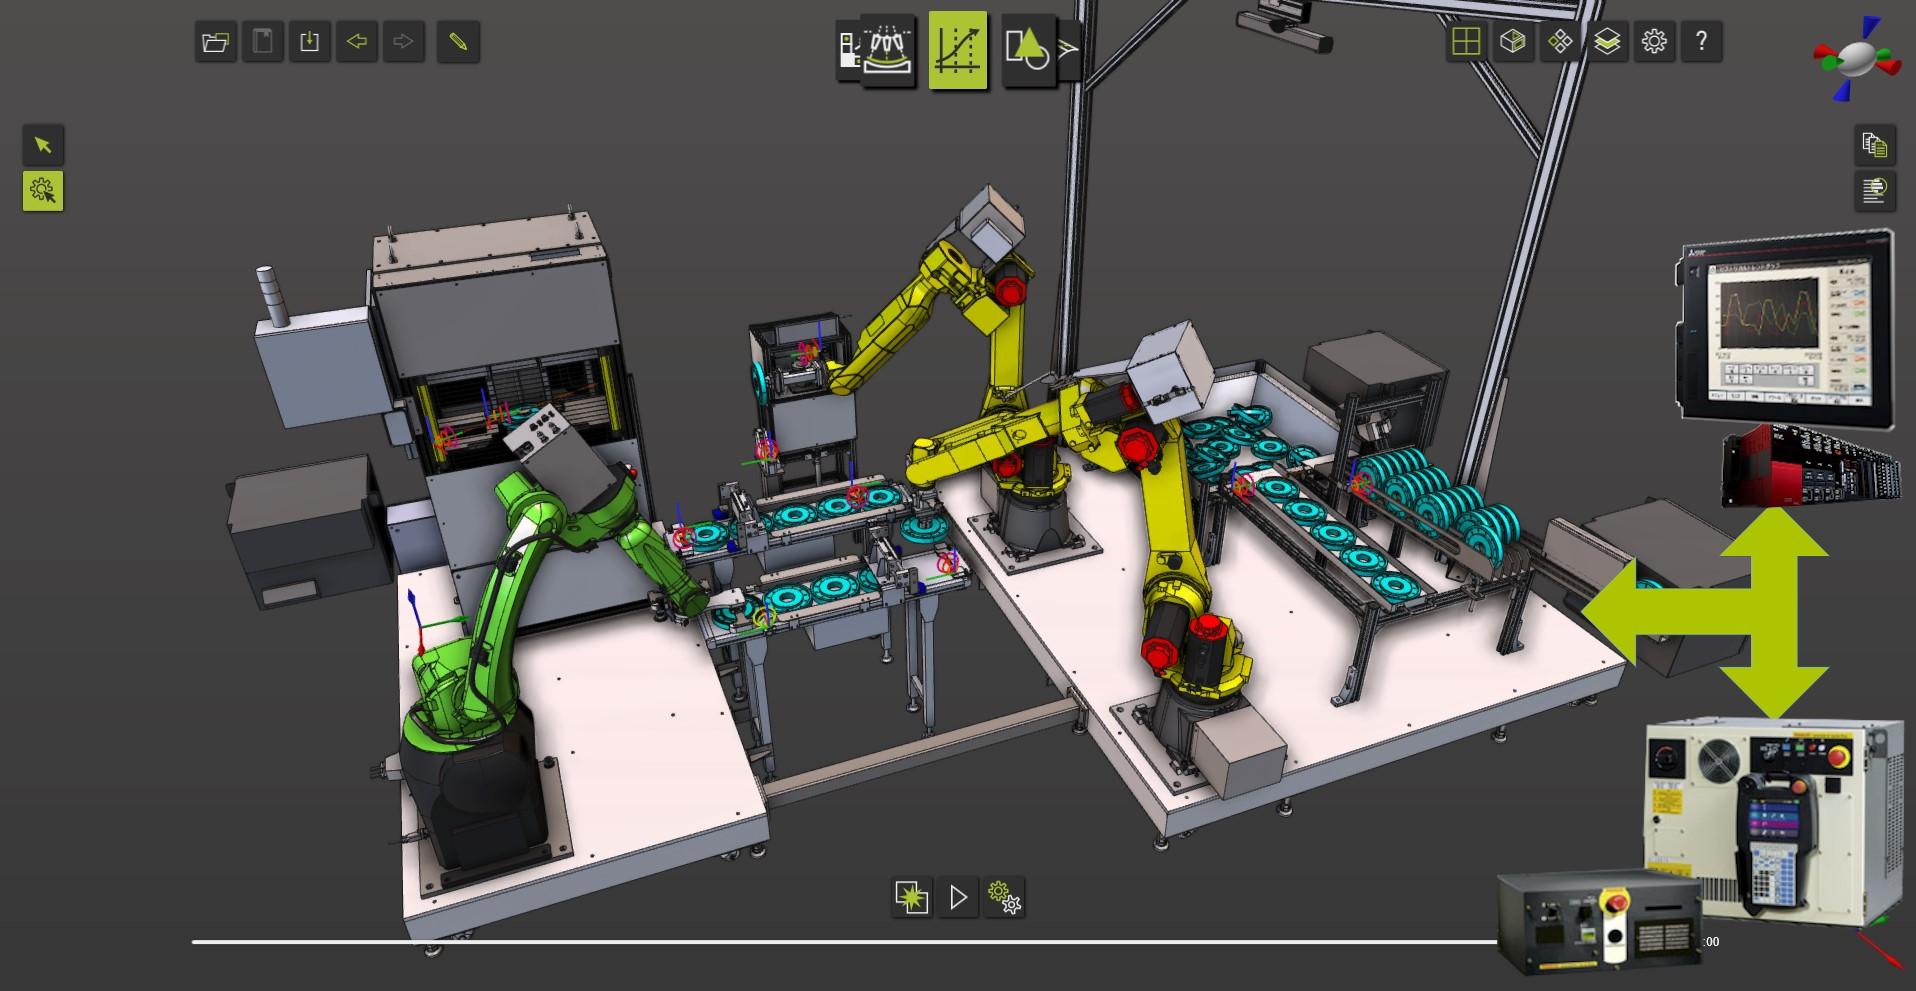 3D-Simulationssoftware im Automobilbau